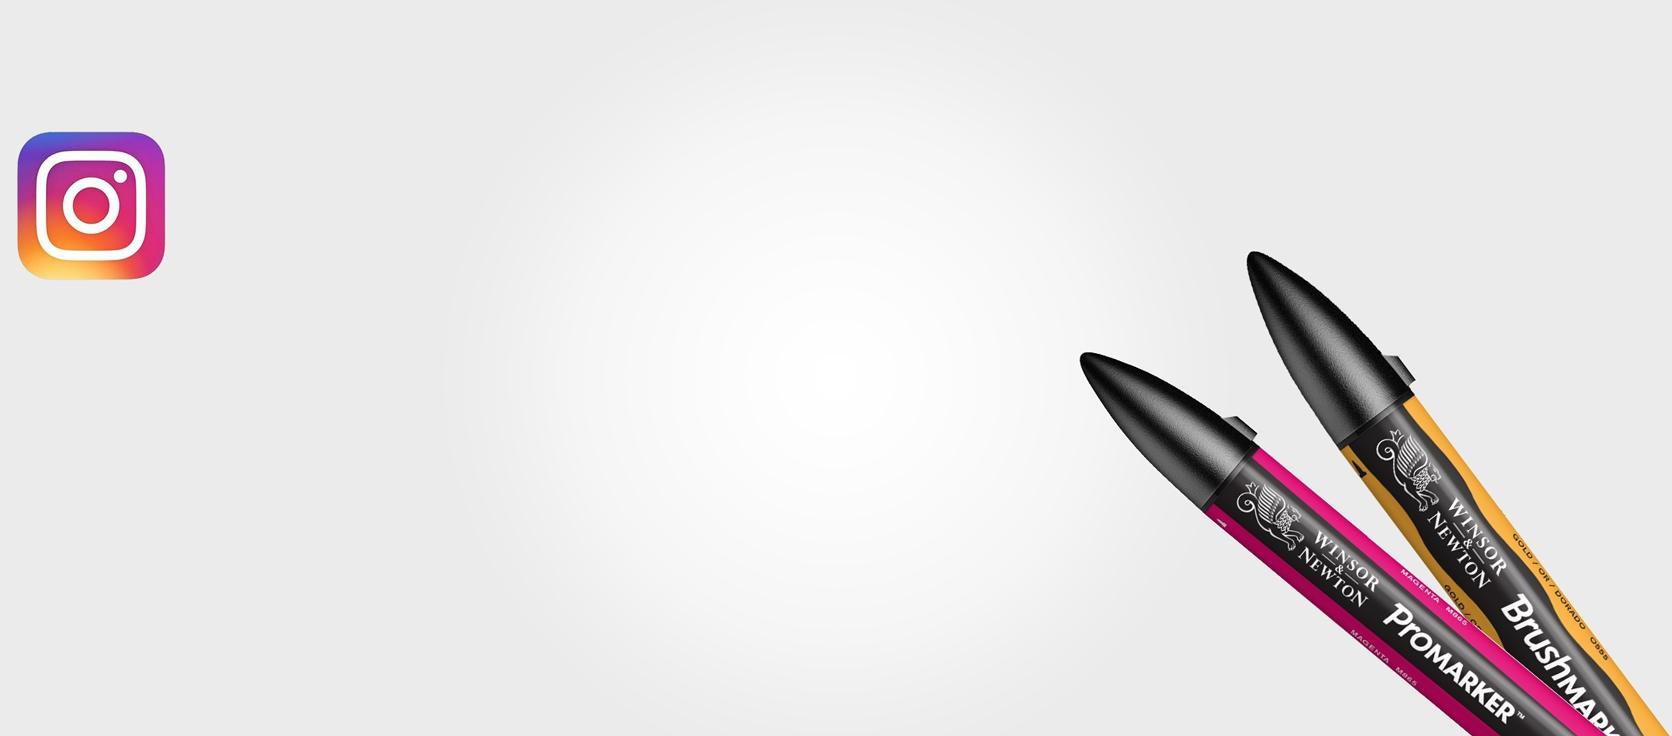 #InspiredByProMarker <br/> #WinsorNewtonChallenge <br/>